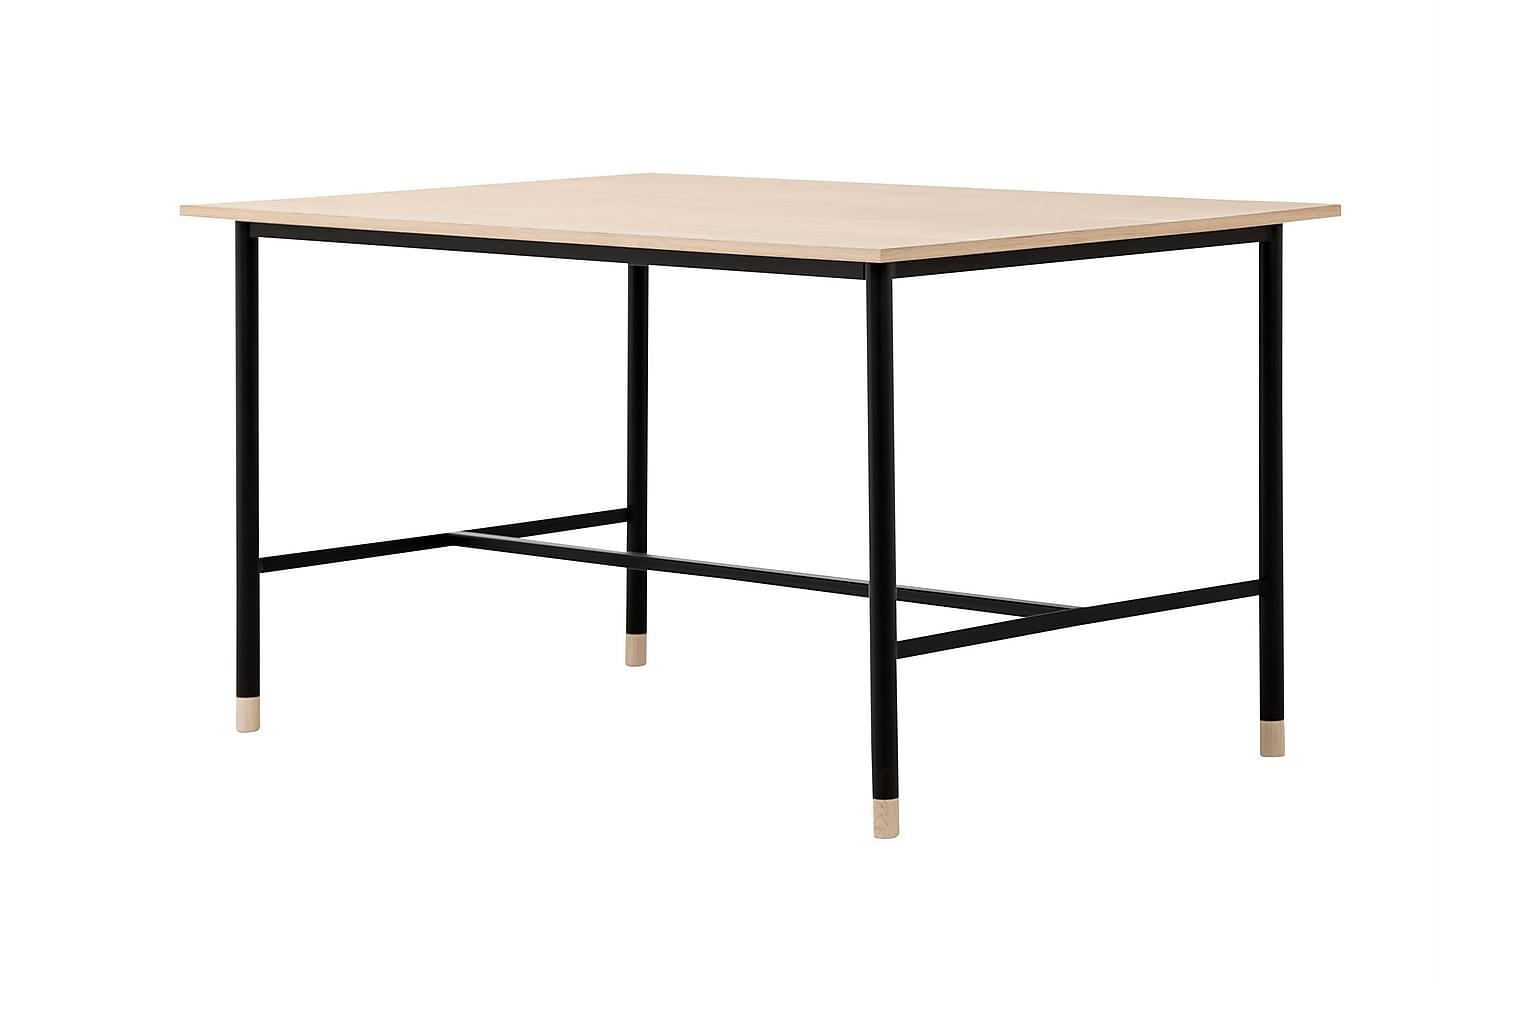 BRANDY Pöytä 138 Tammi/Musta